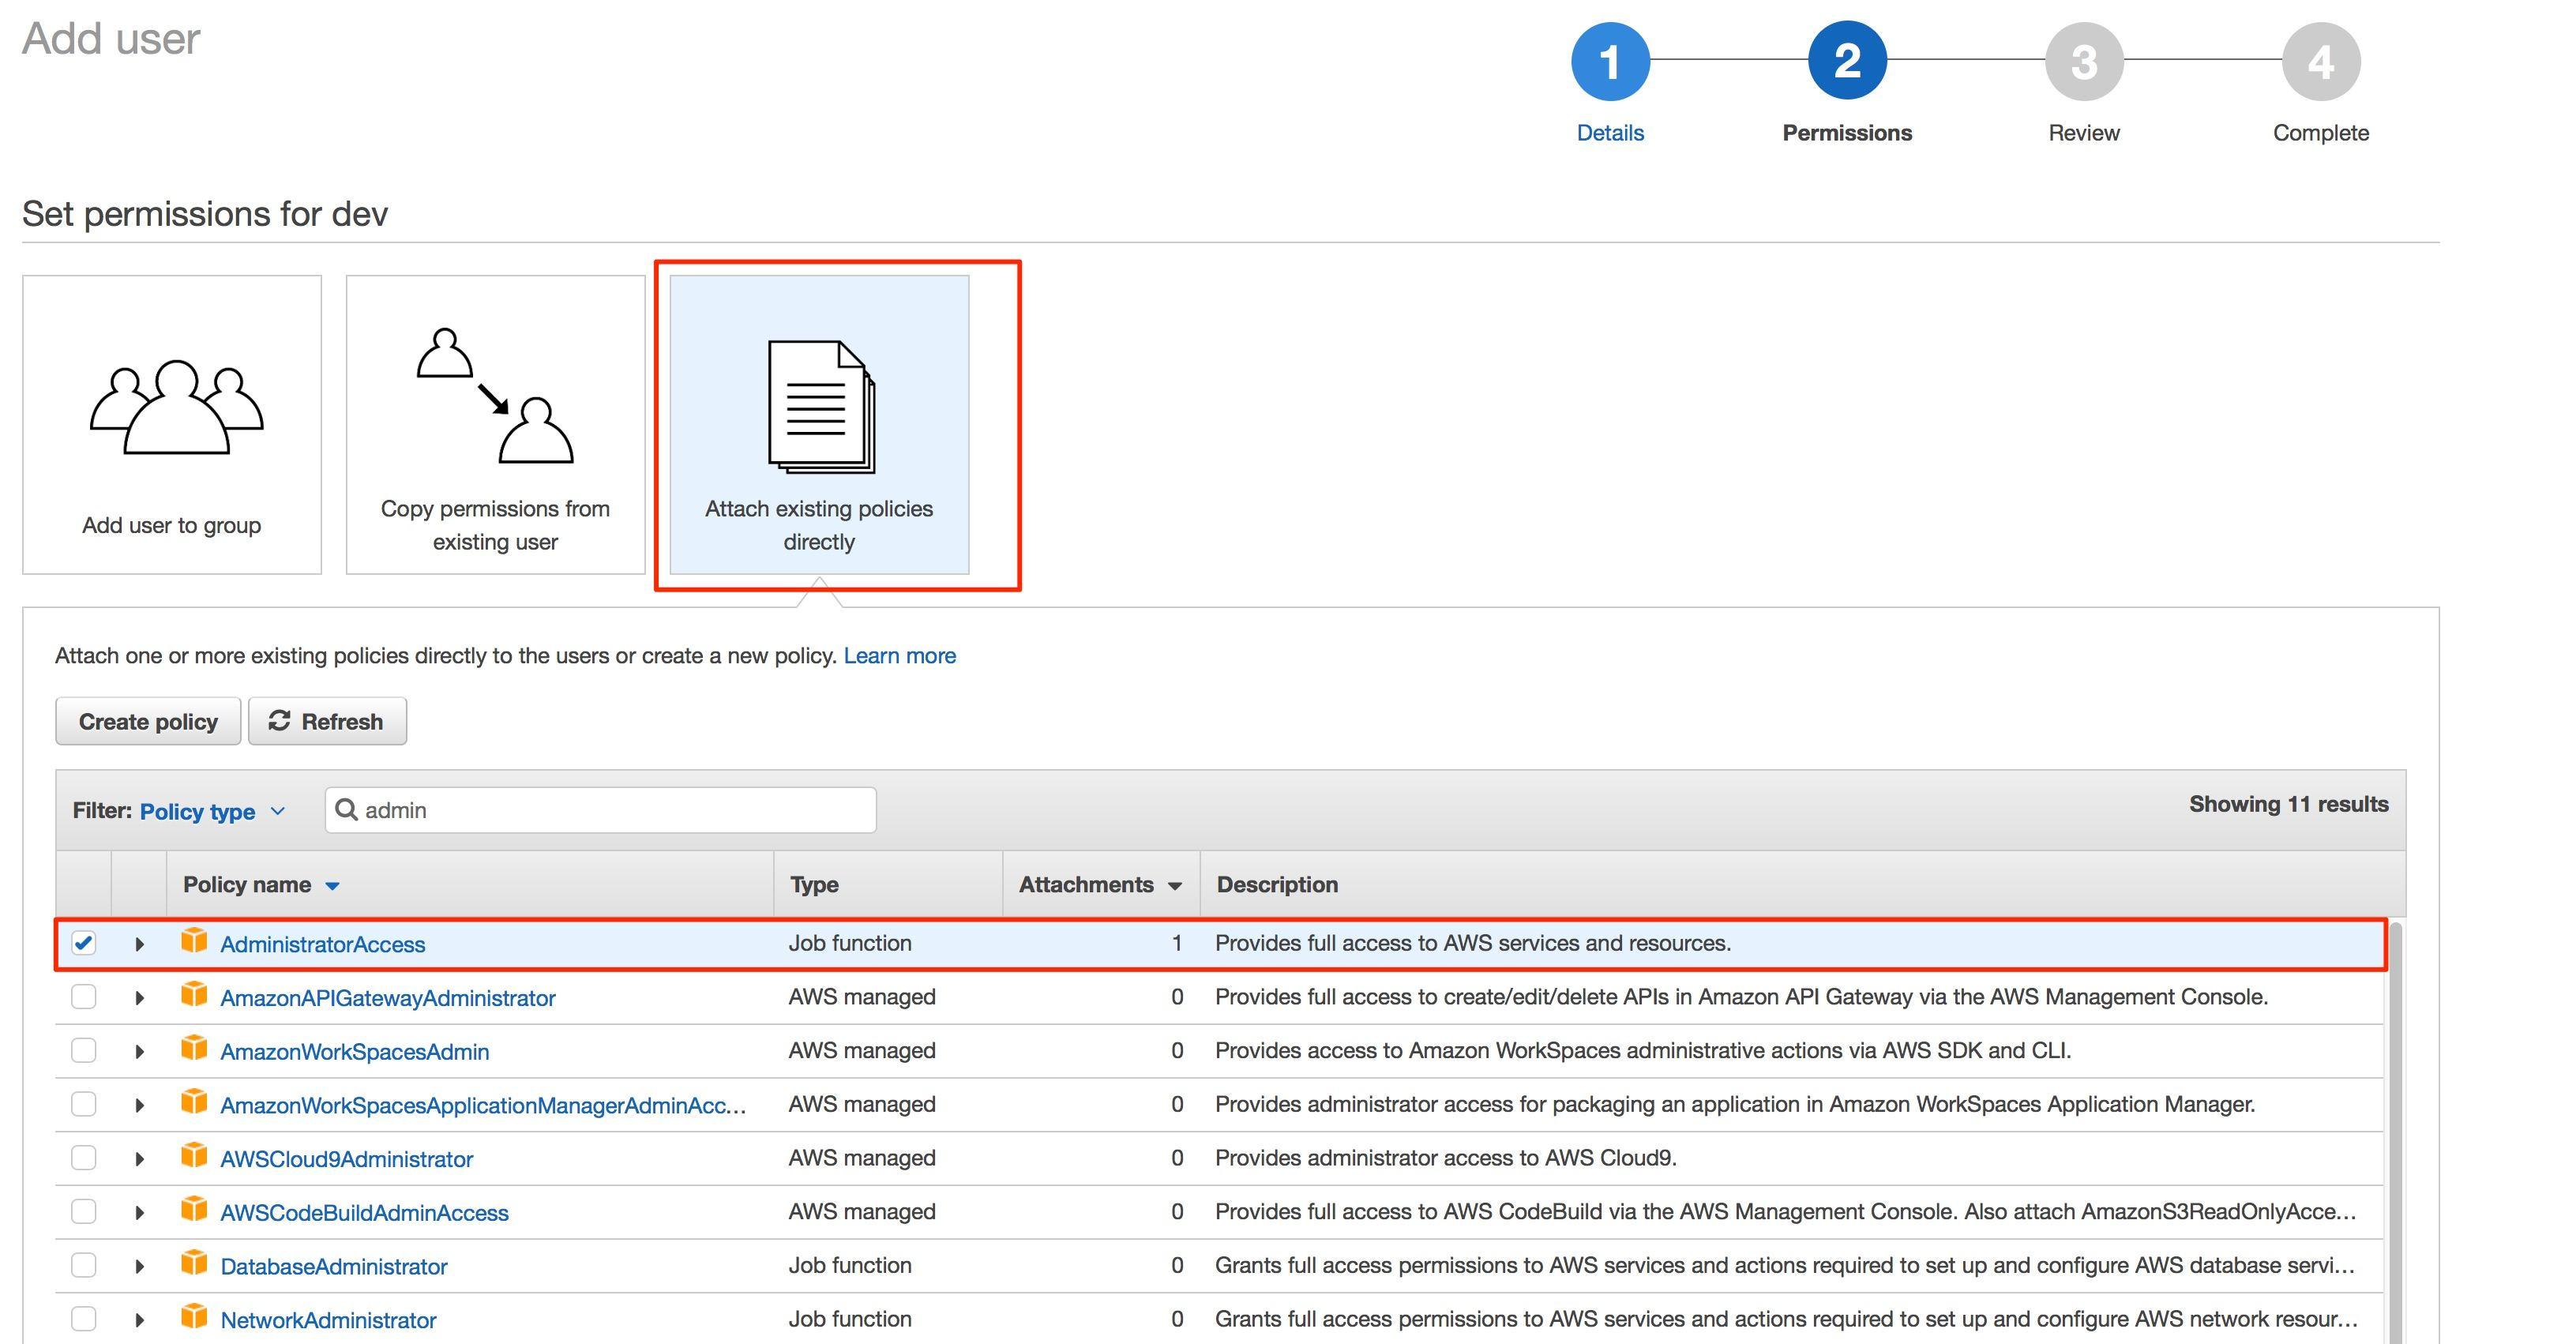 tạo tài khoản iam user programmatic access bước 2